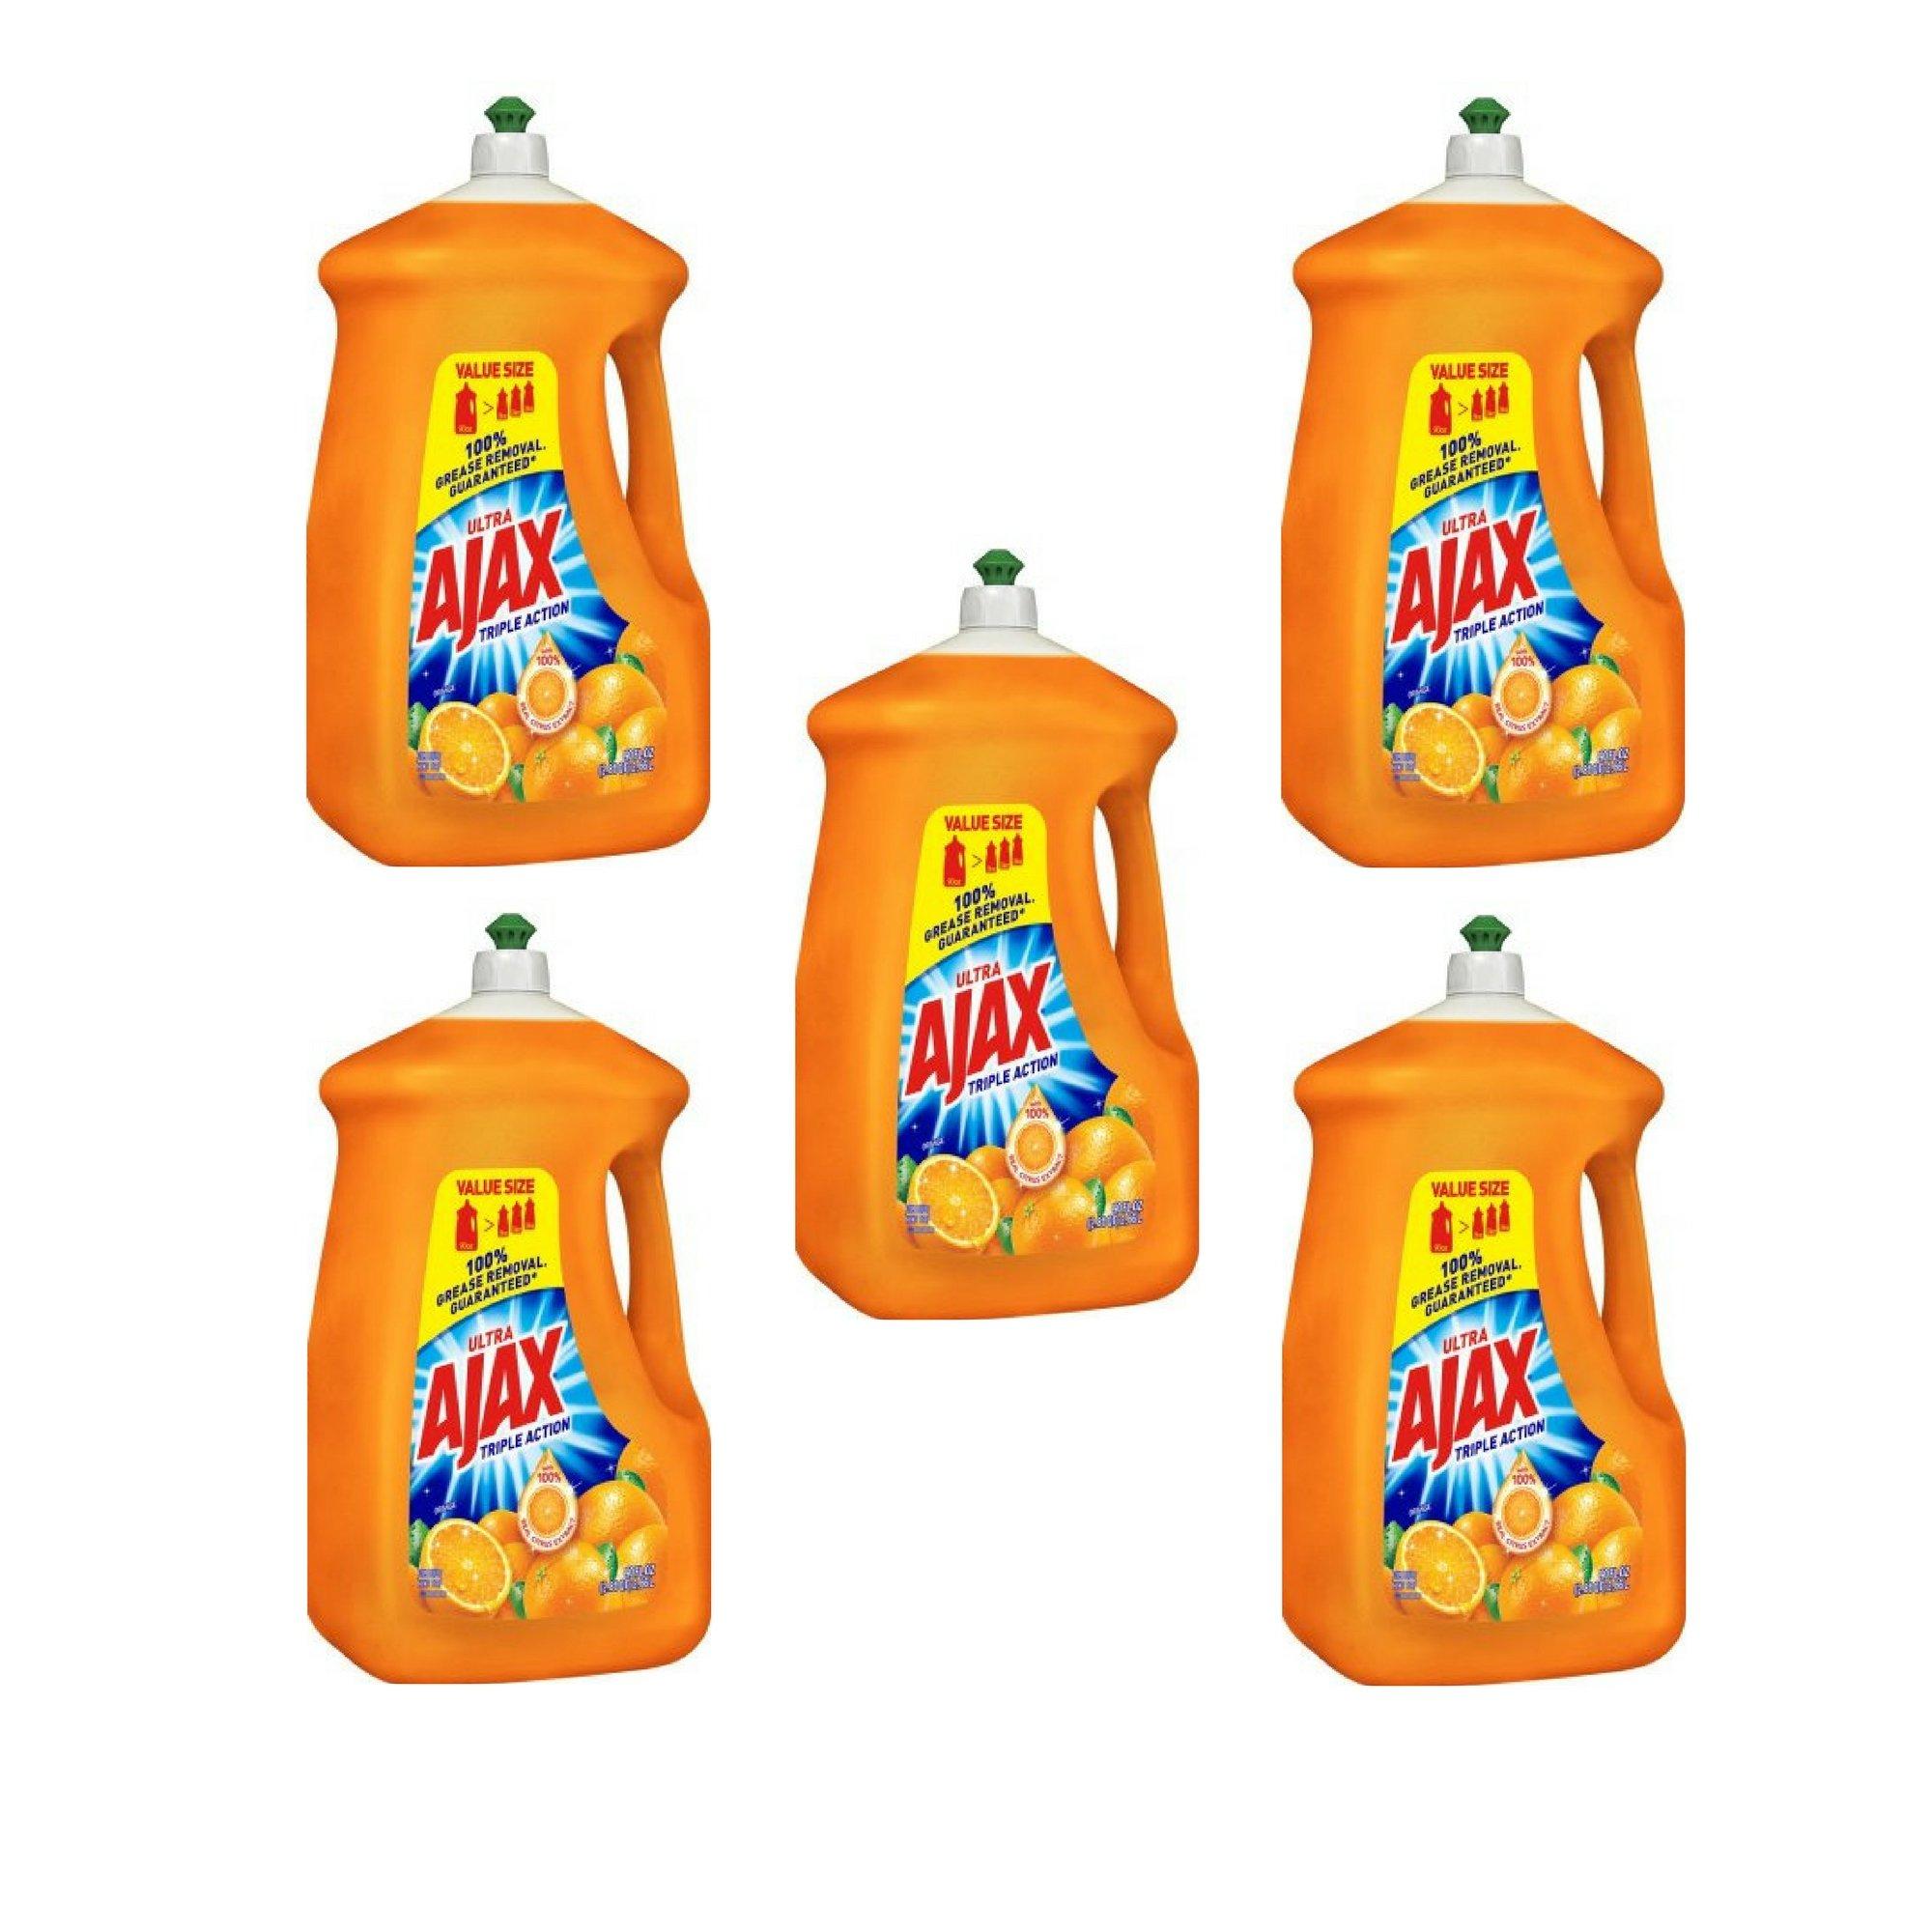 Ajax 90 fl oz Ultra Triple Action Liquid Dish Soap, Orange - 5 Pack